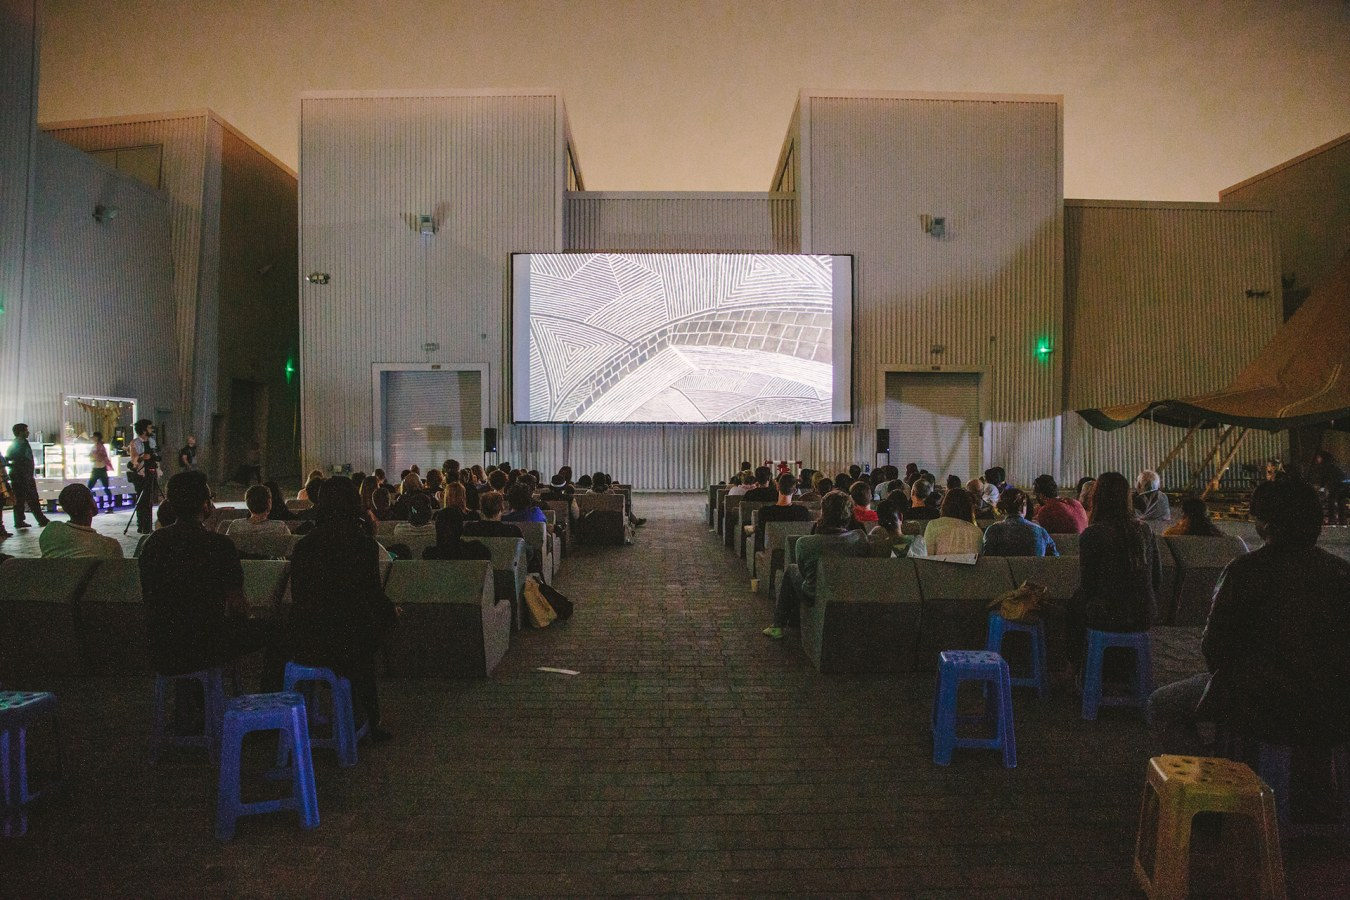 Cinema Akil outdoor screen